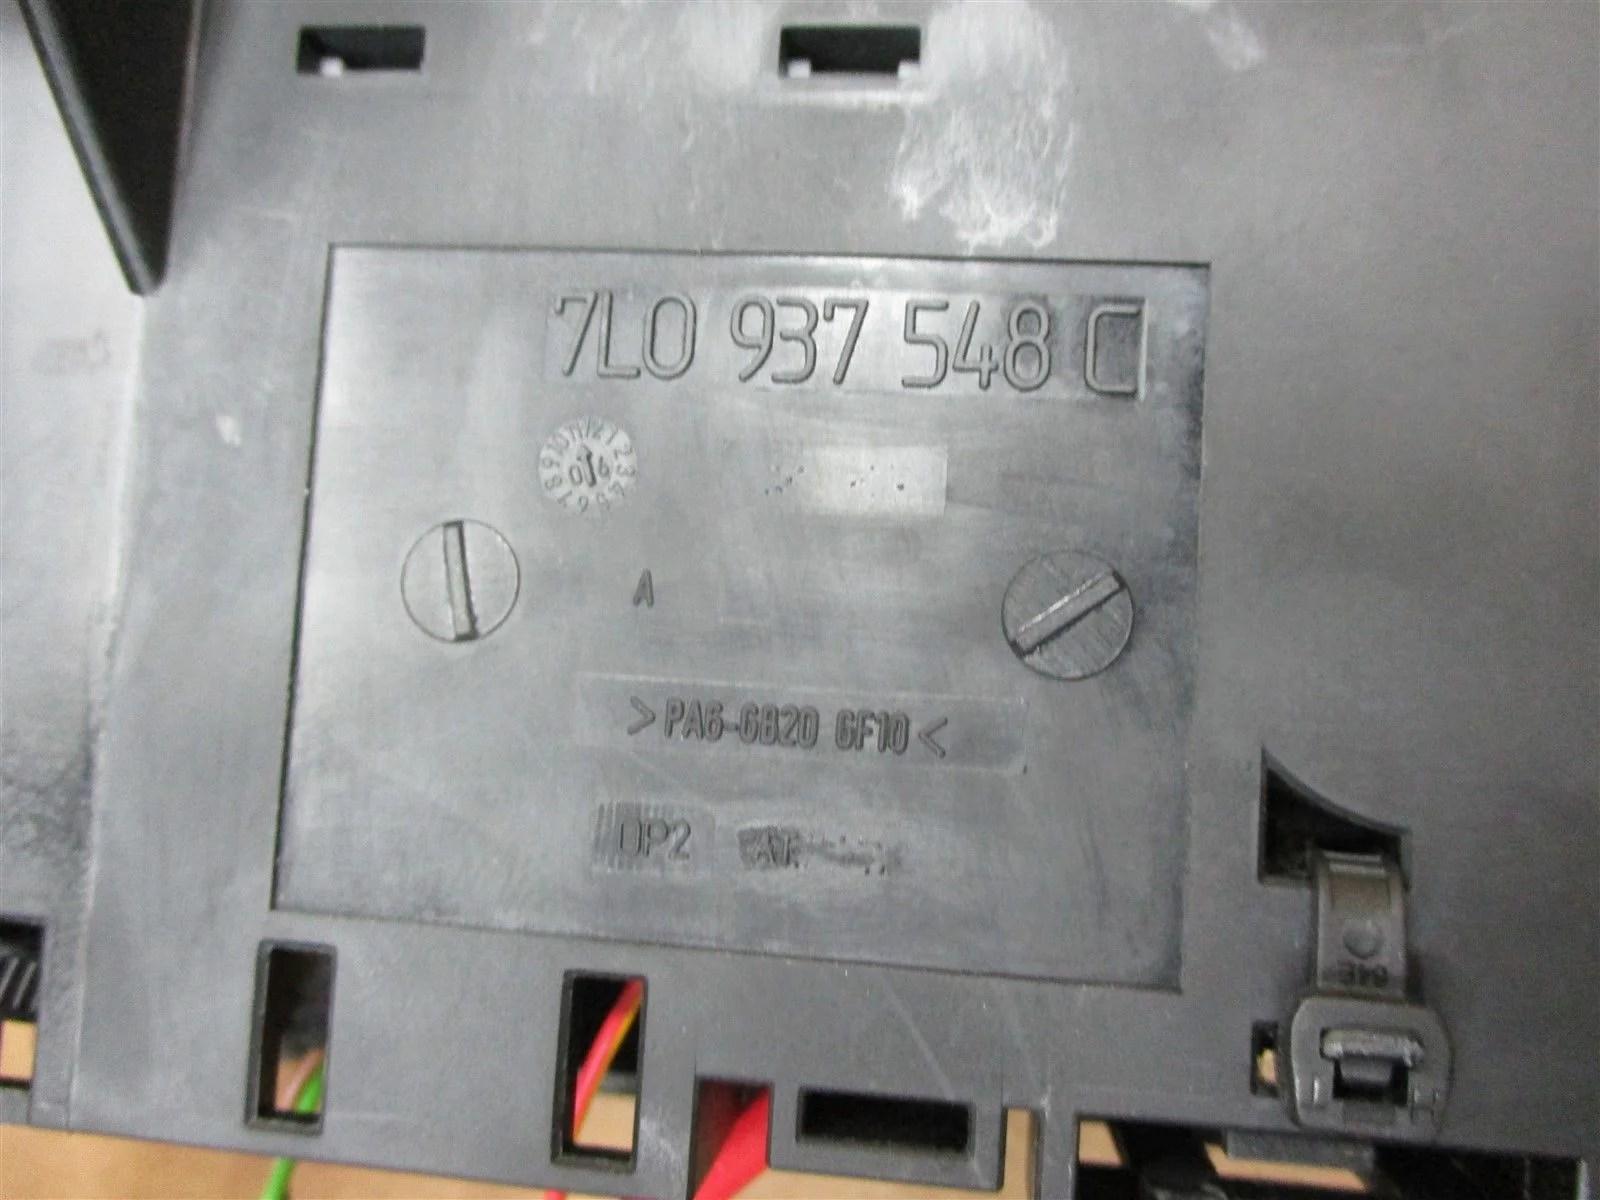 hight resolution of 08 cayenne awd porsche 957 fuse box 7l0937548c 3d0951253a 55 471